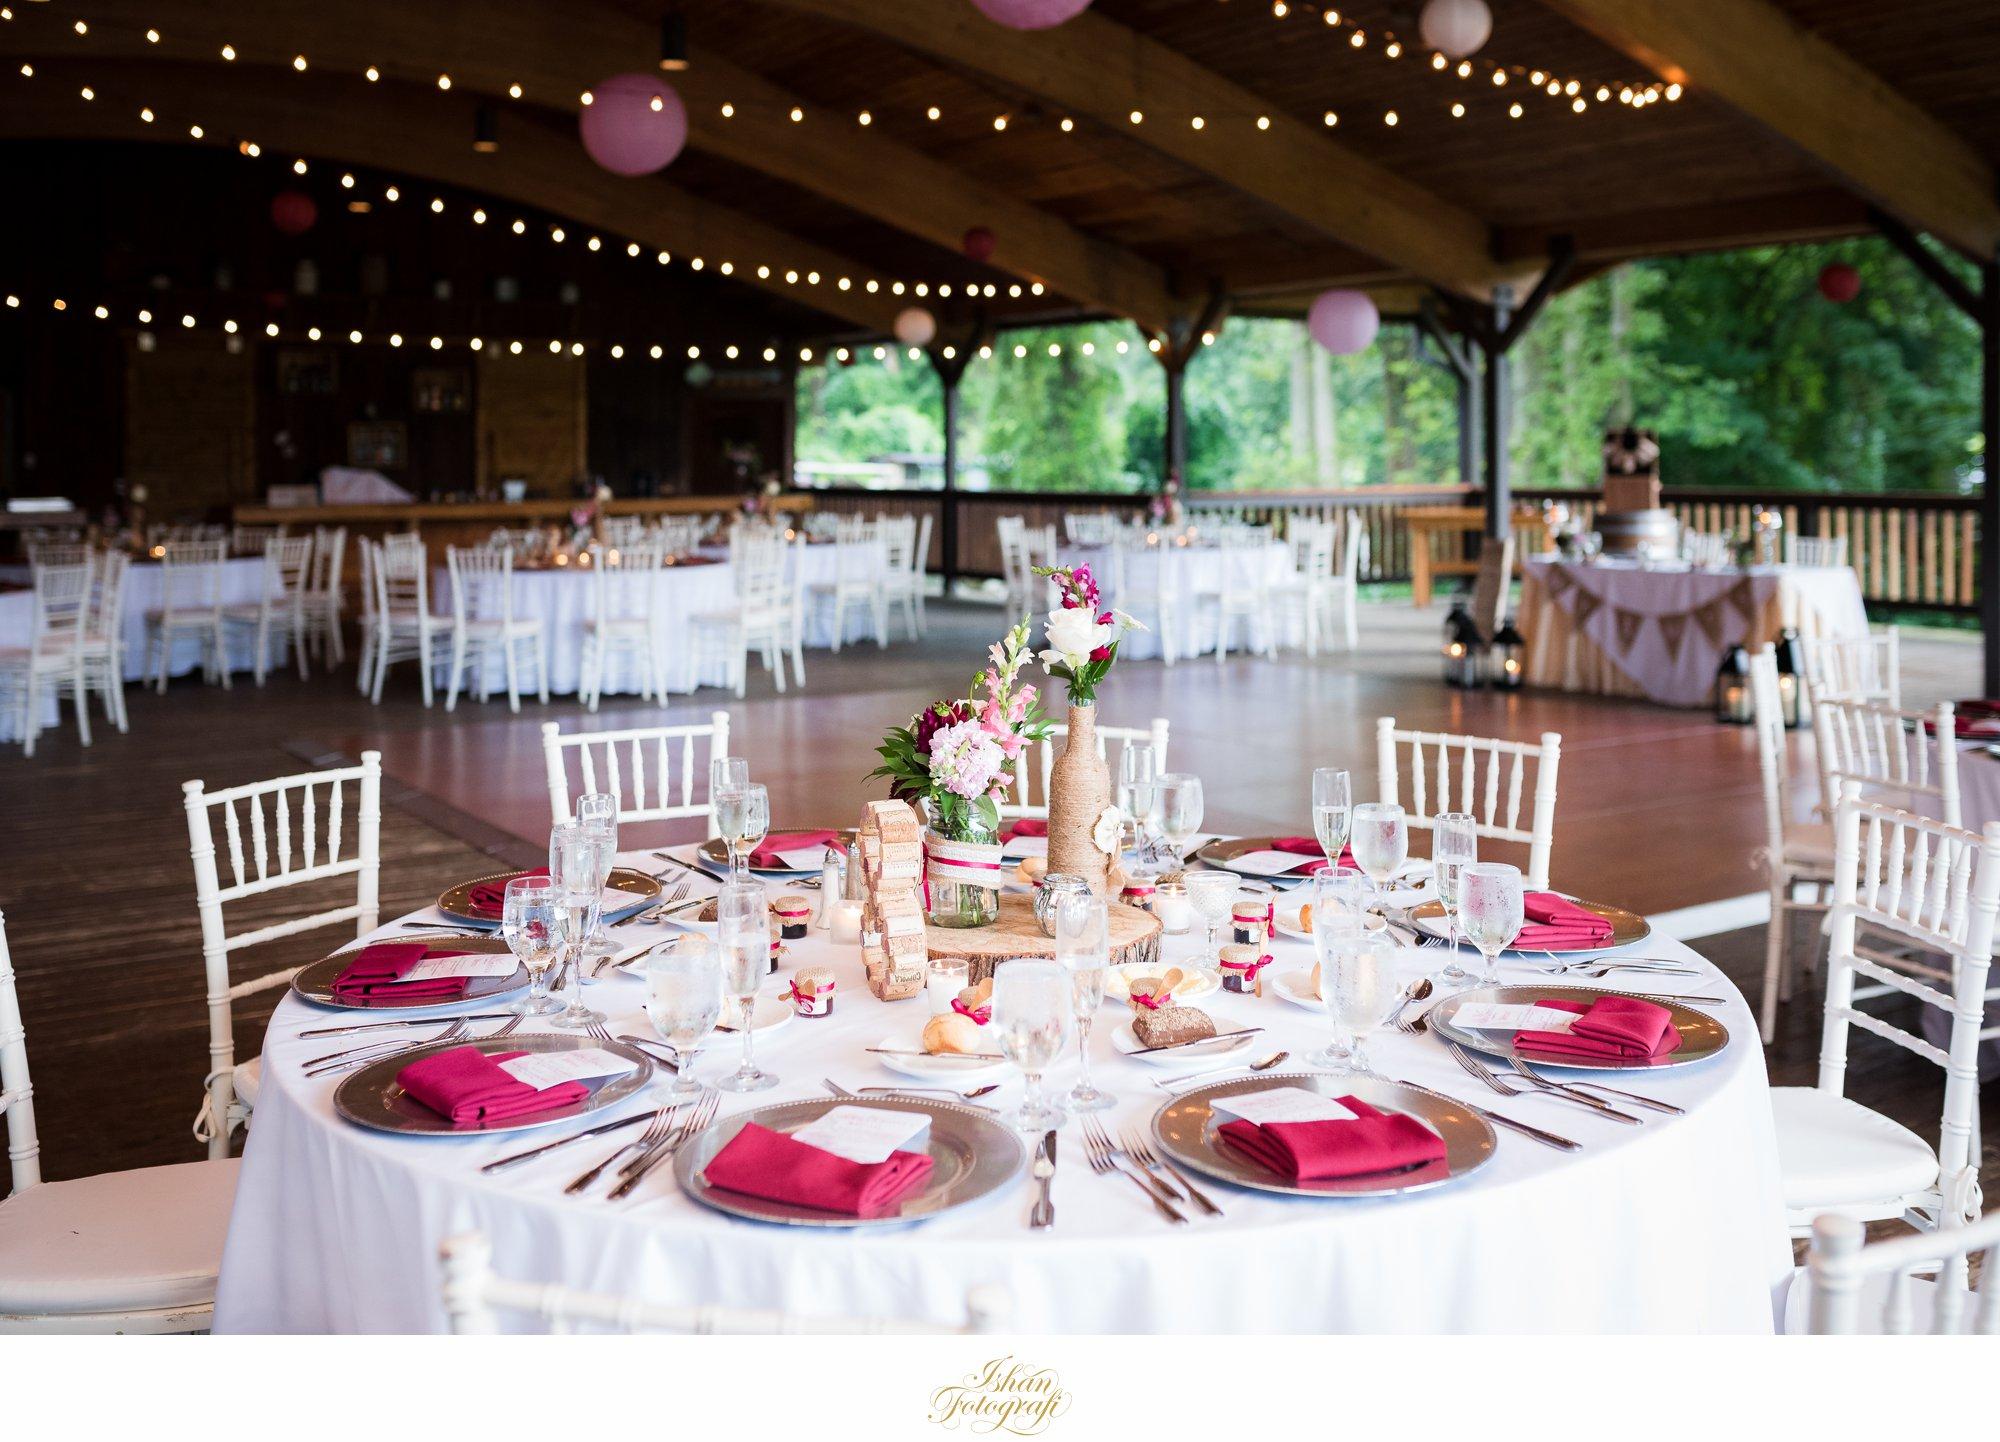 minerals-resort-and-spa-wedding-photos-hamburg-new-jersey